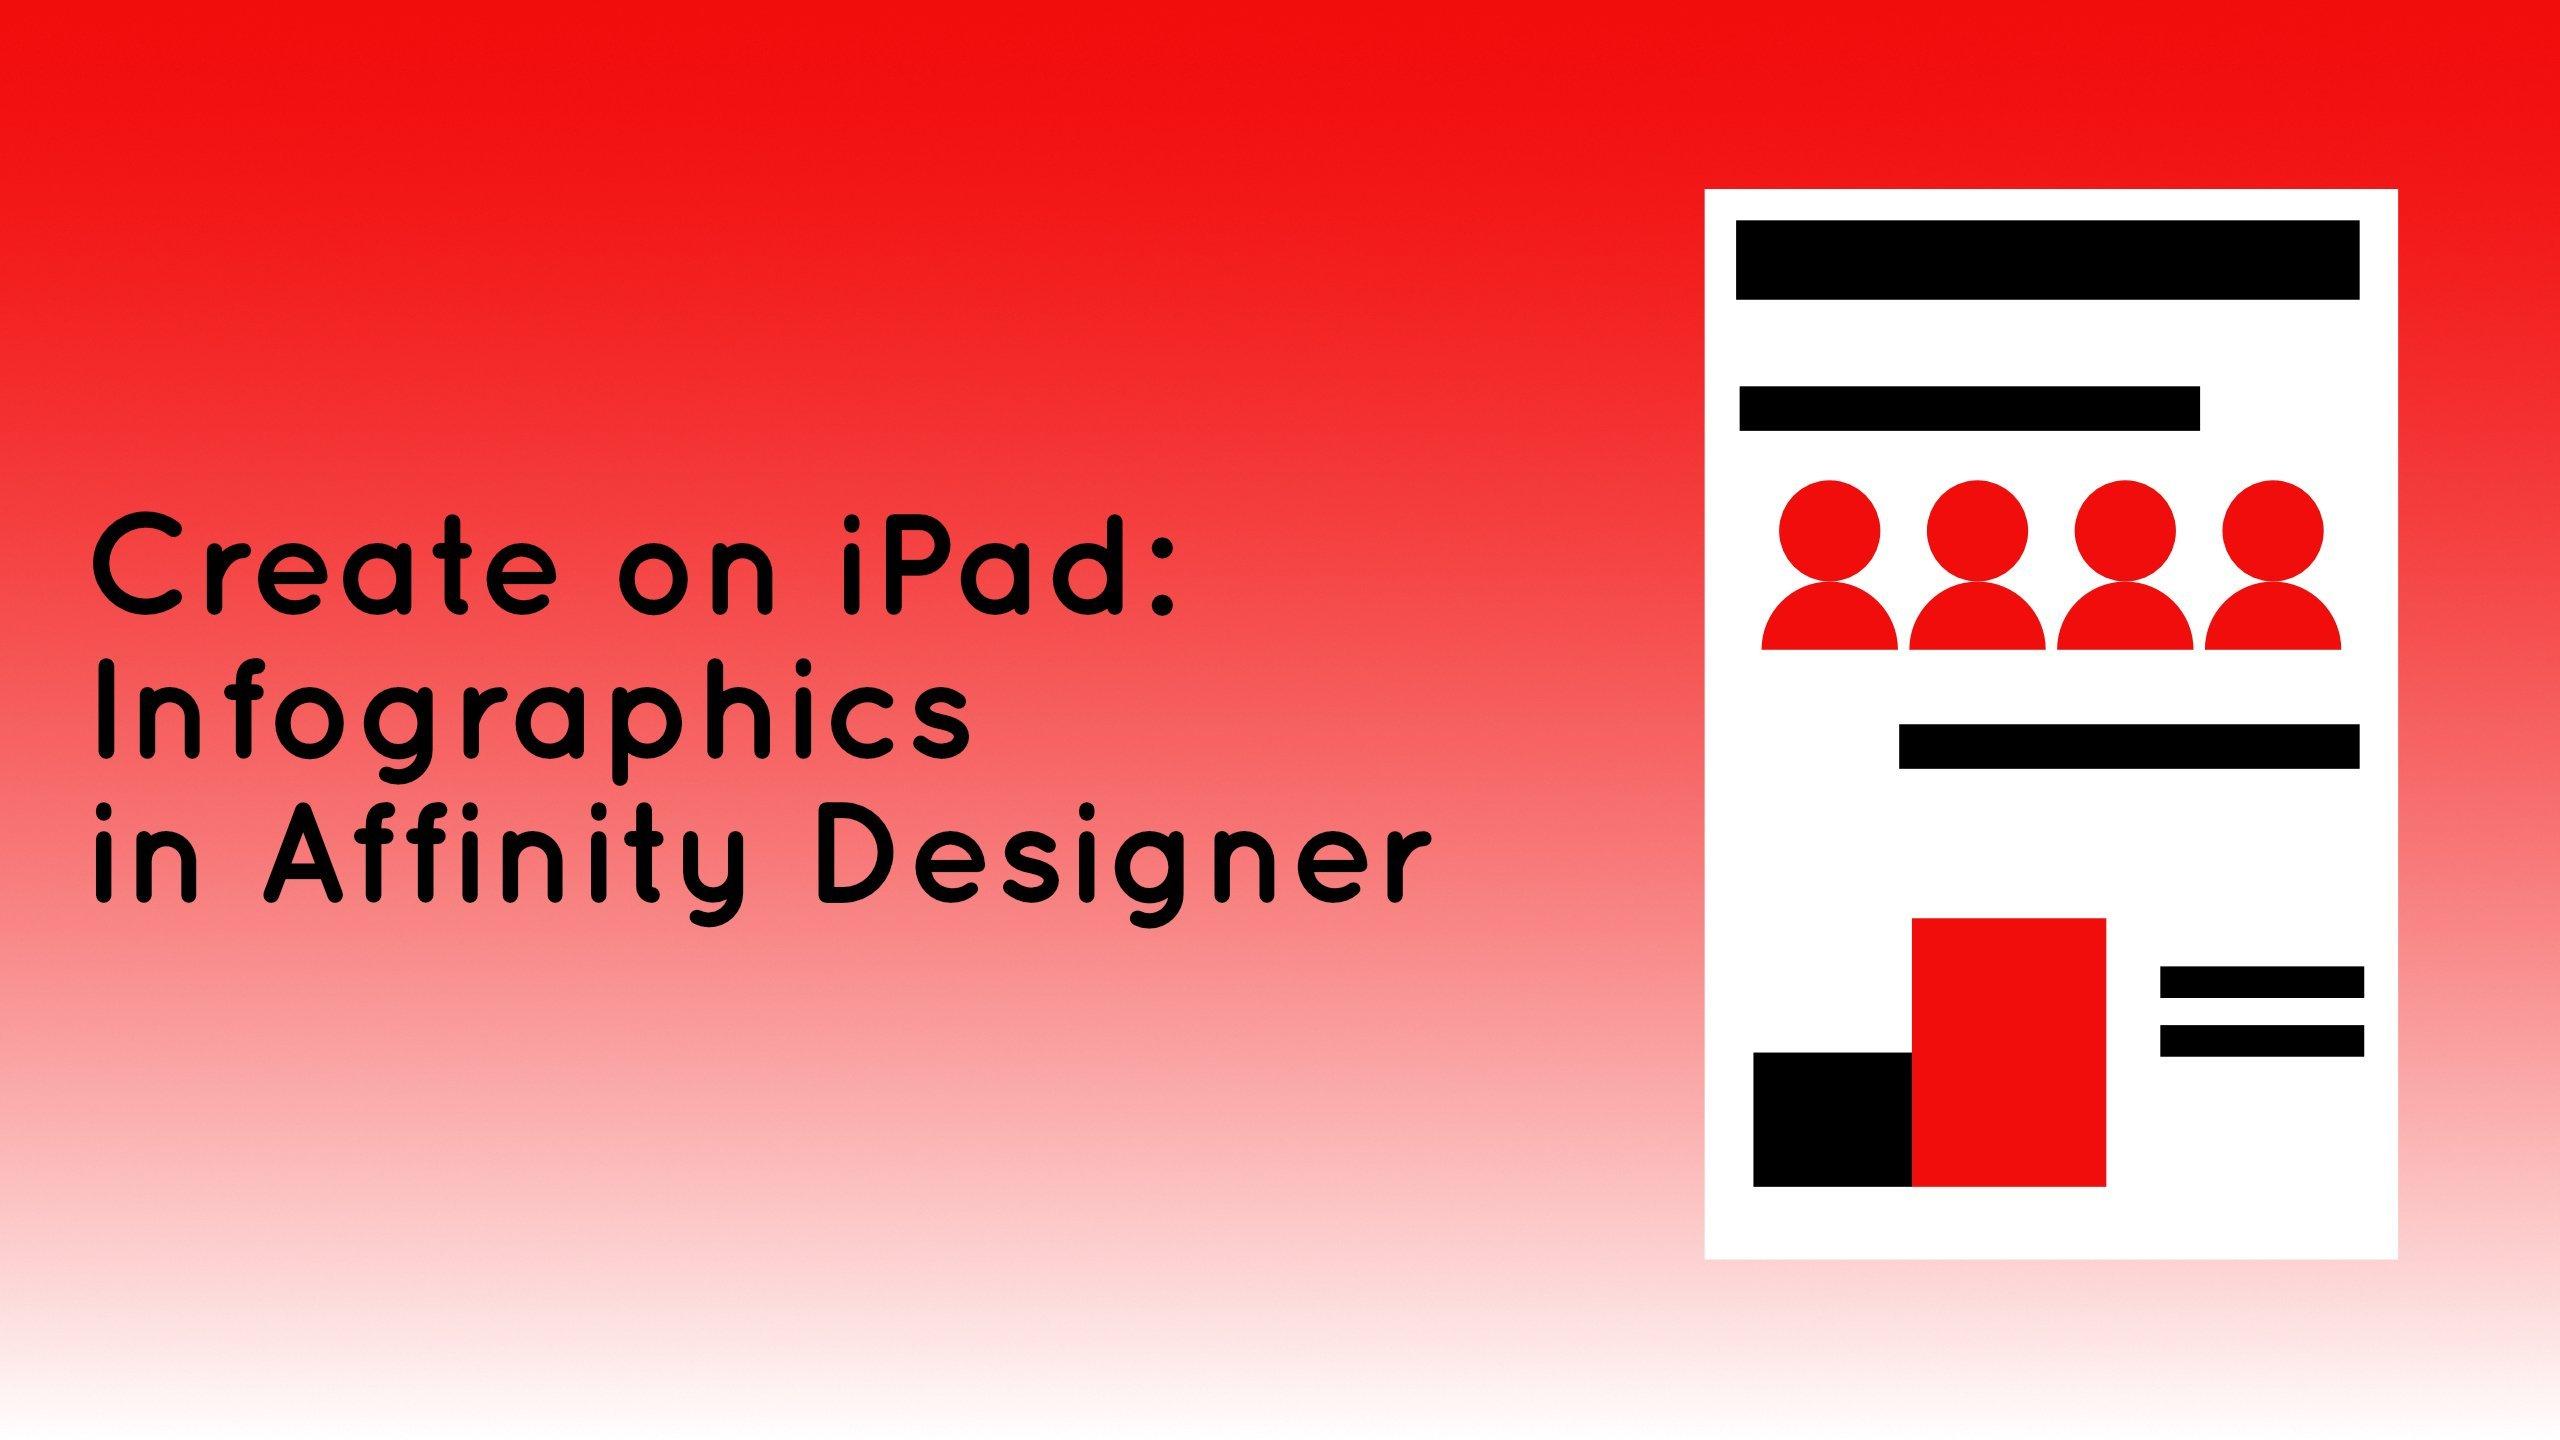 Create On iPad: Infographics in Affinity Designer